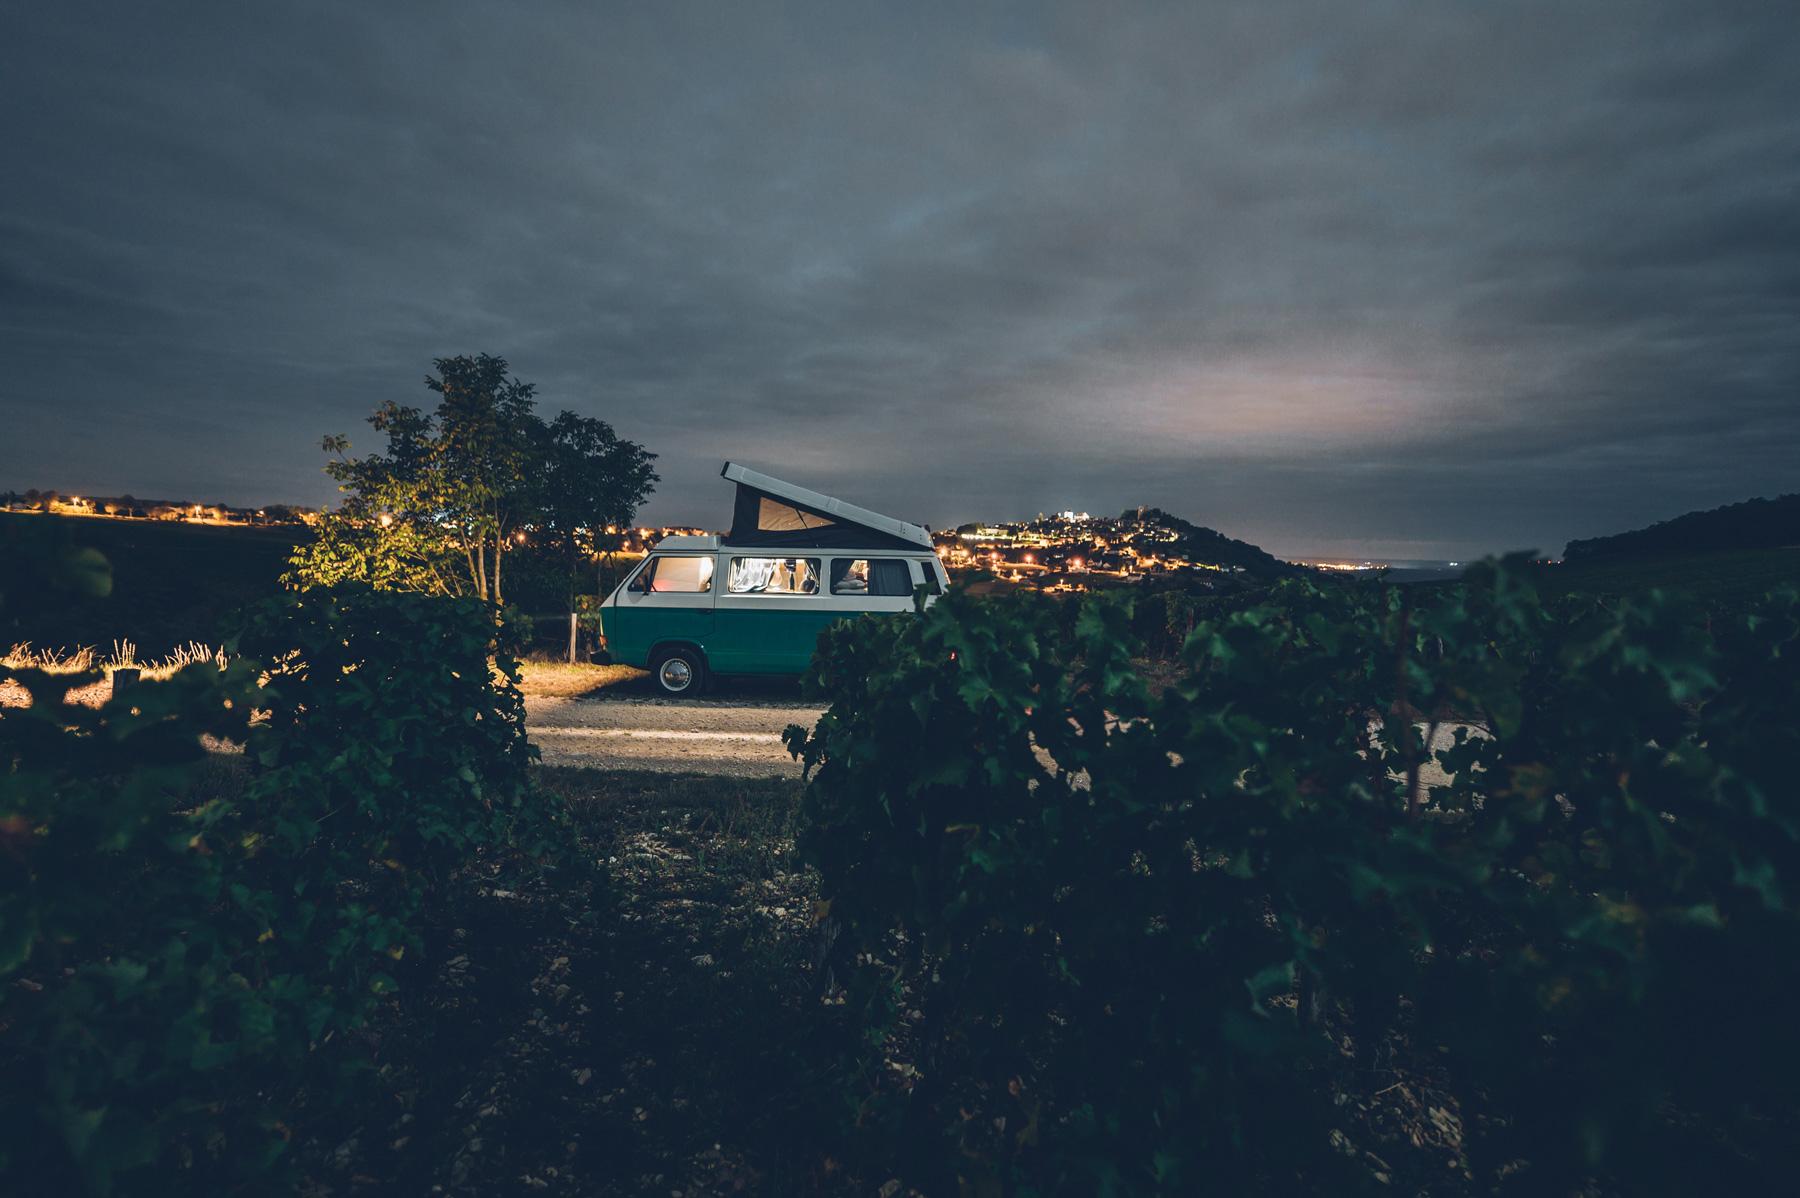 Nuit en van à Sancerre